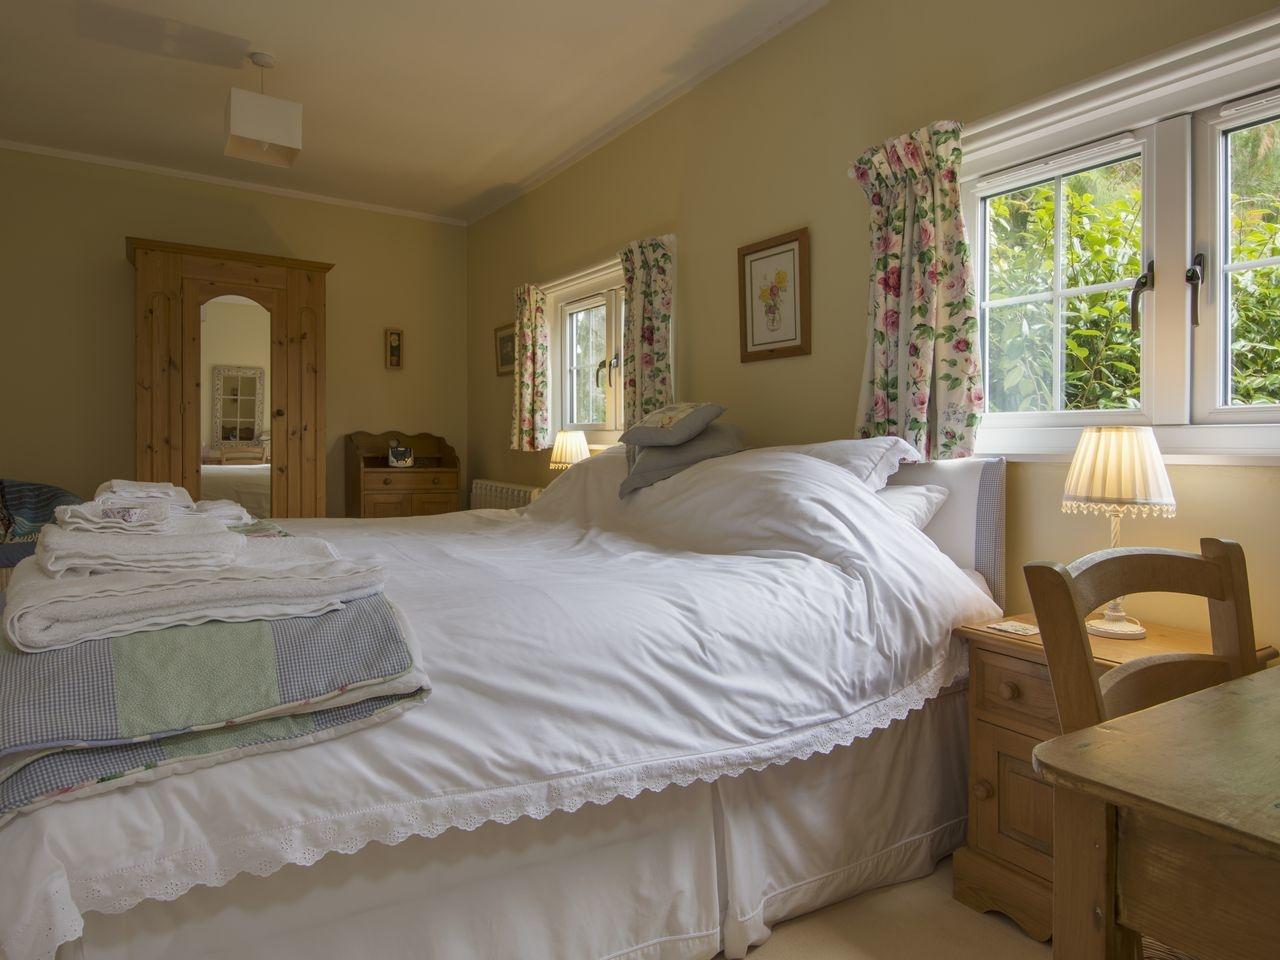 Tawcroft Cottage